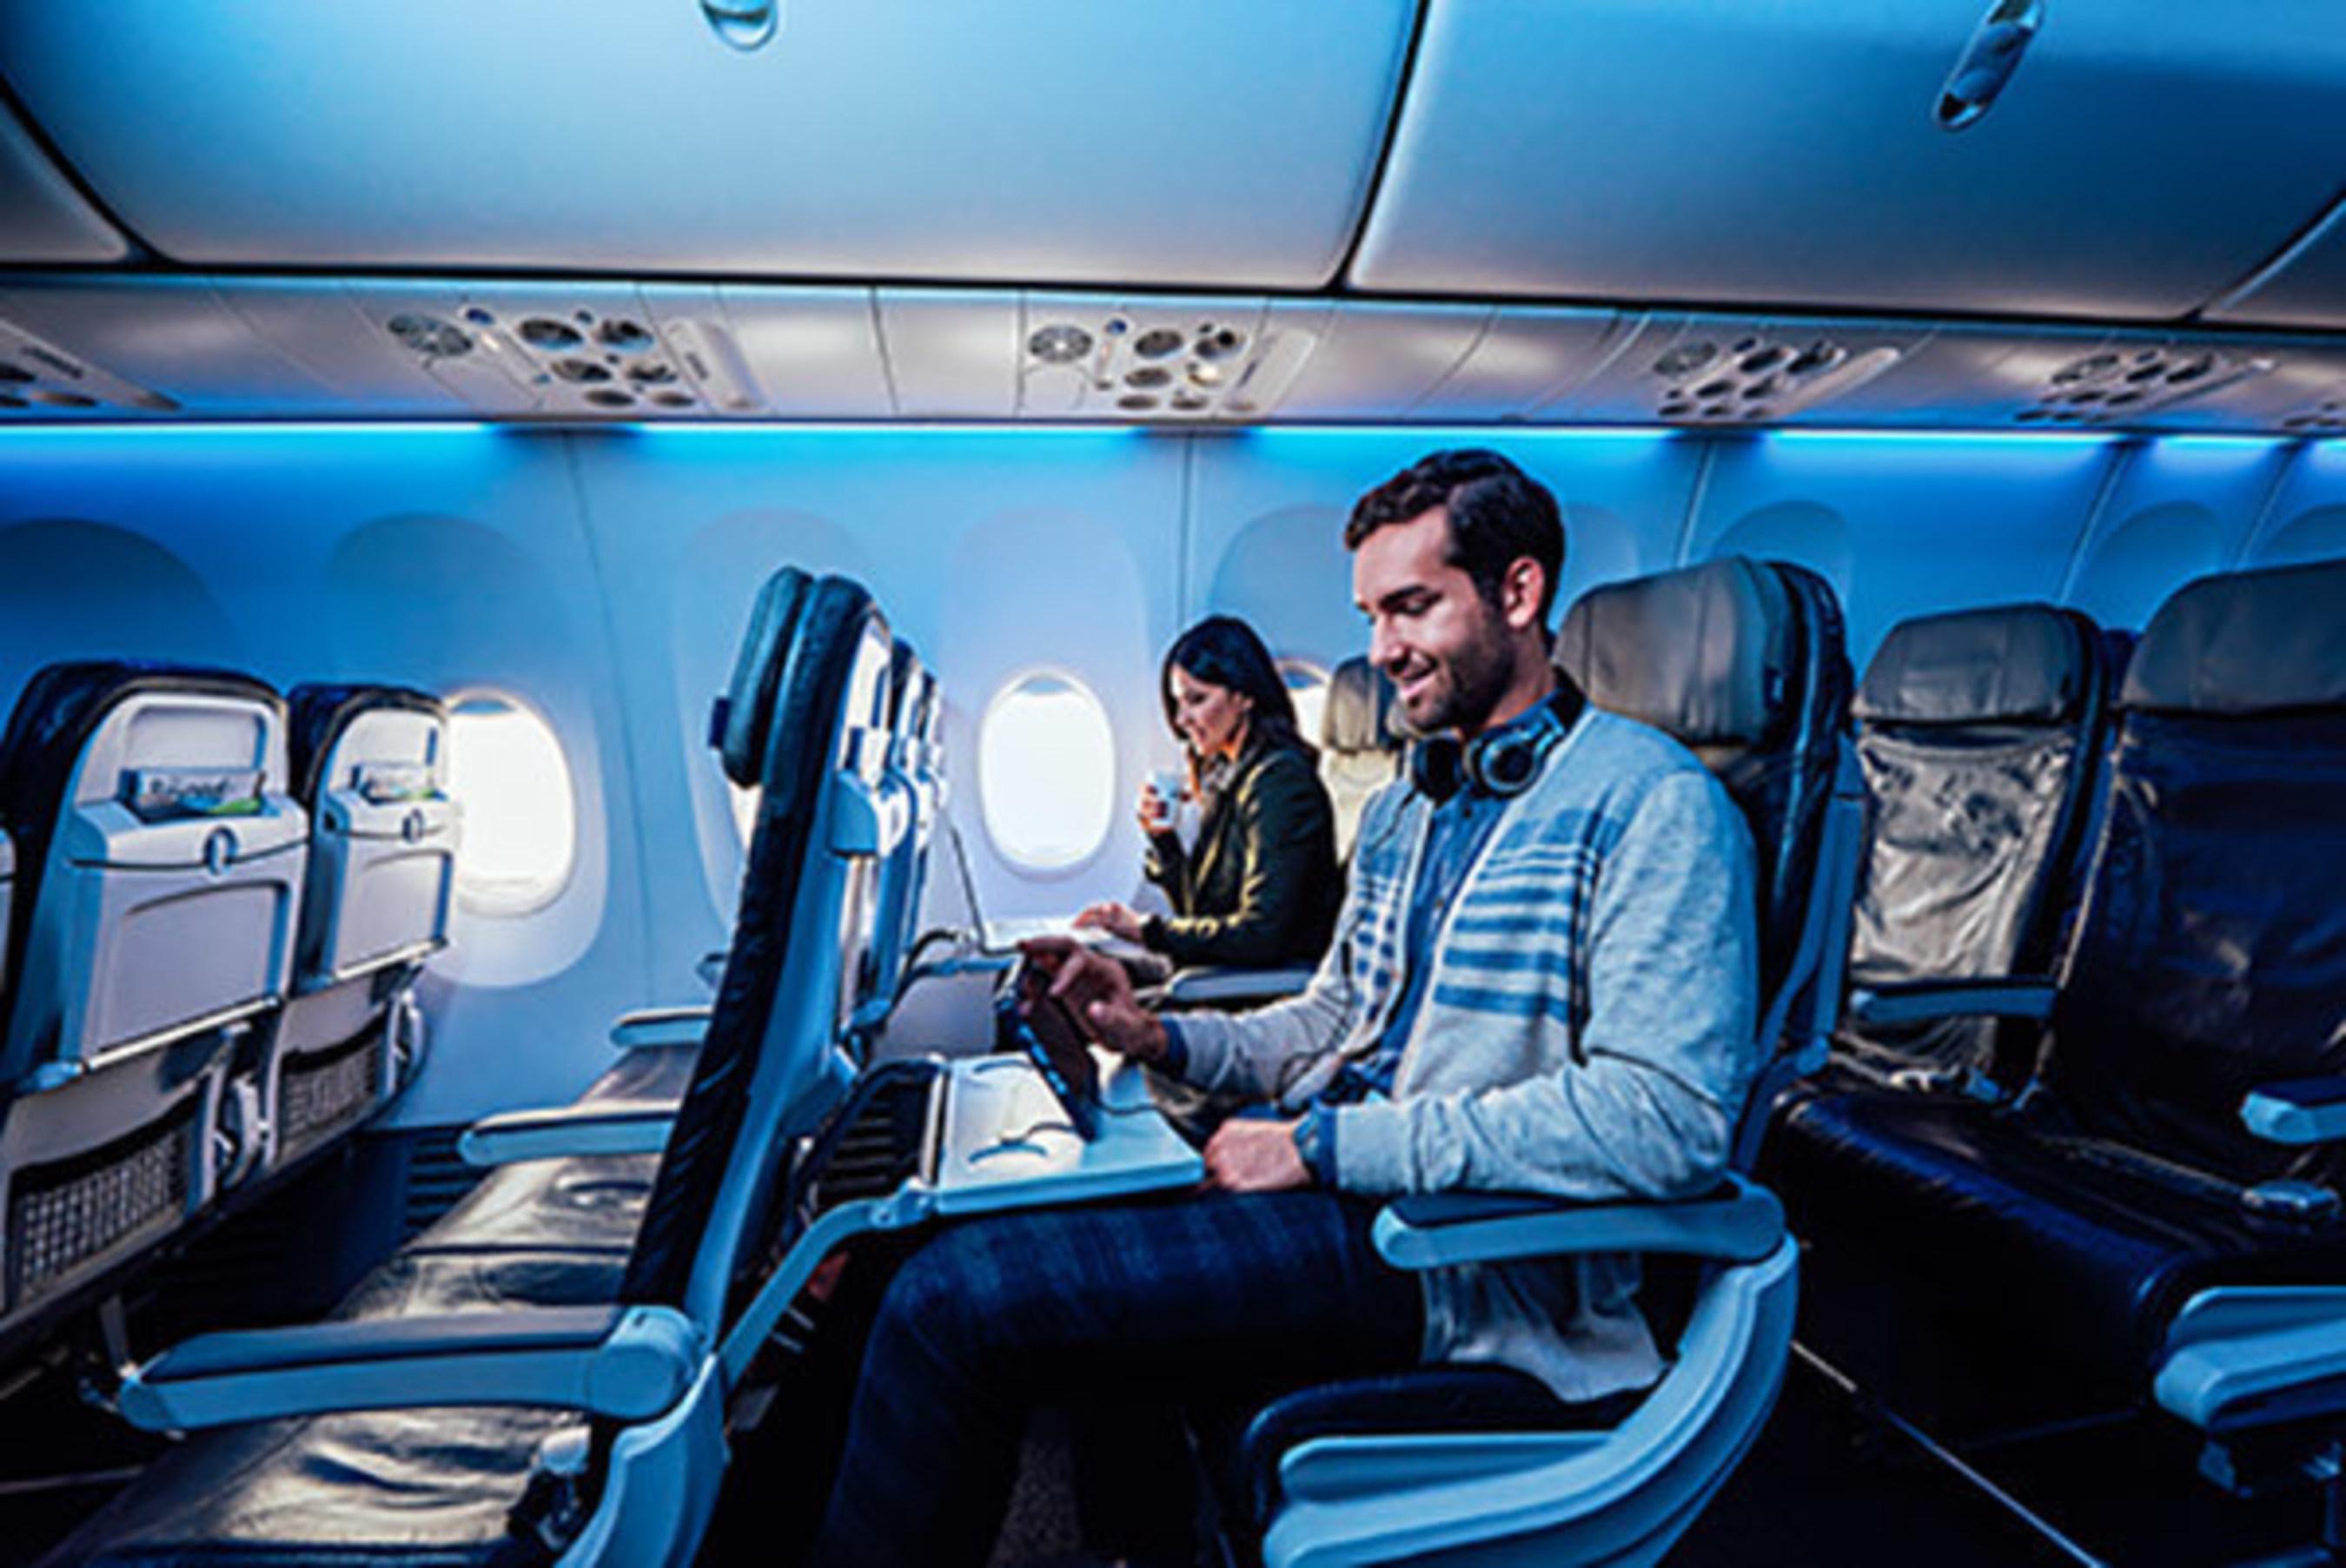 Alaska Airlines Handicap Seats Wiring Diagrams 800 Thunderboltinternal External Image Pdf Images Gallery